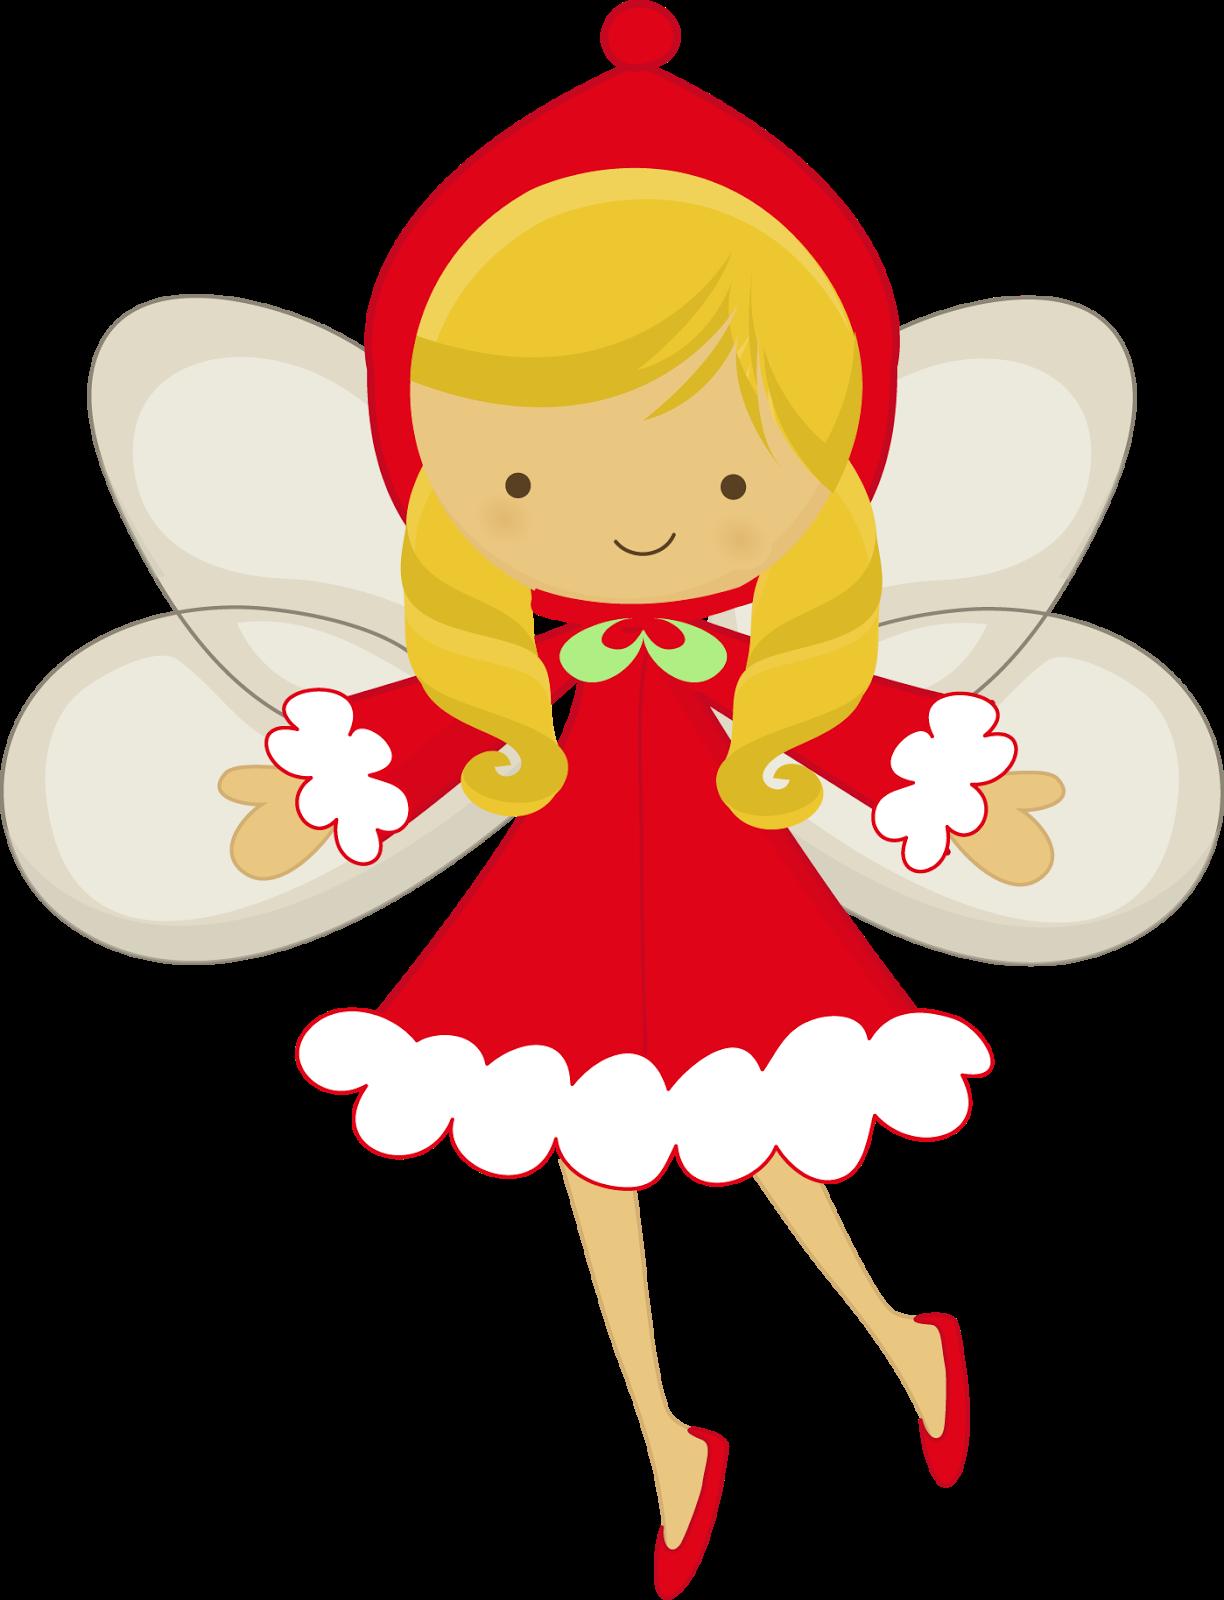 Fairies clipart fairy tale. Sgblogosfera maria jose arg